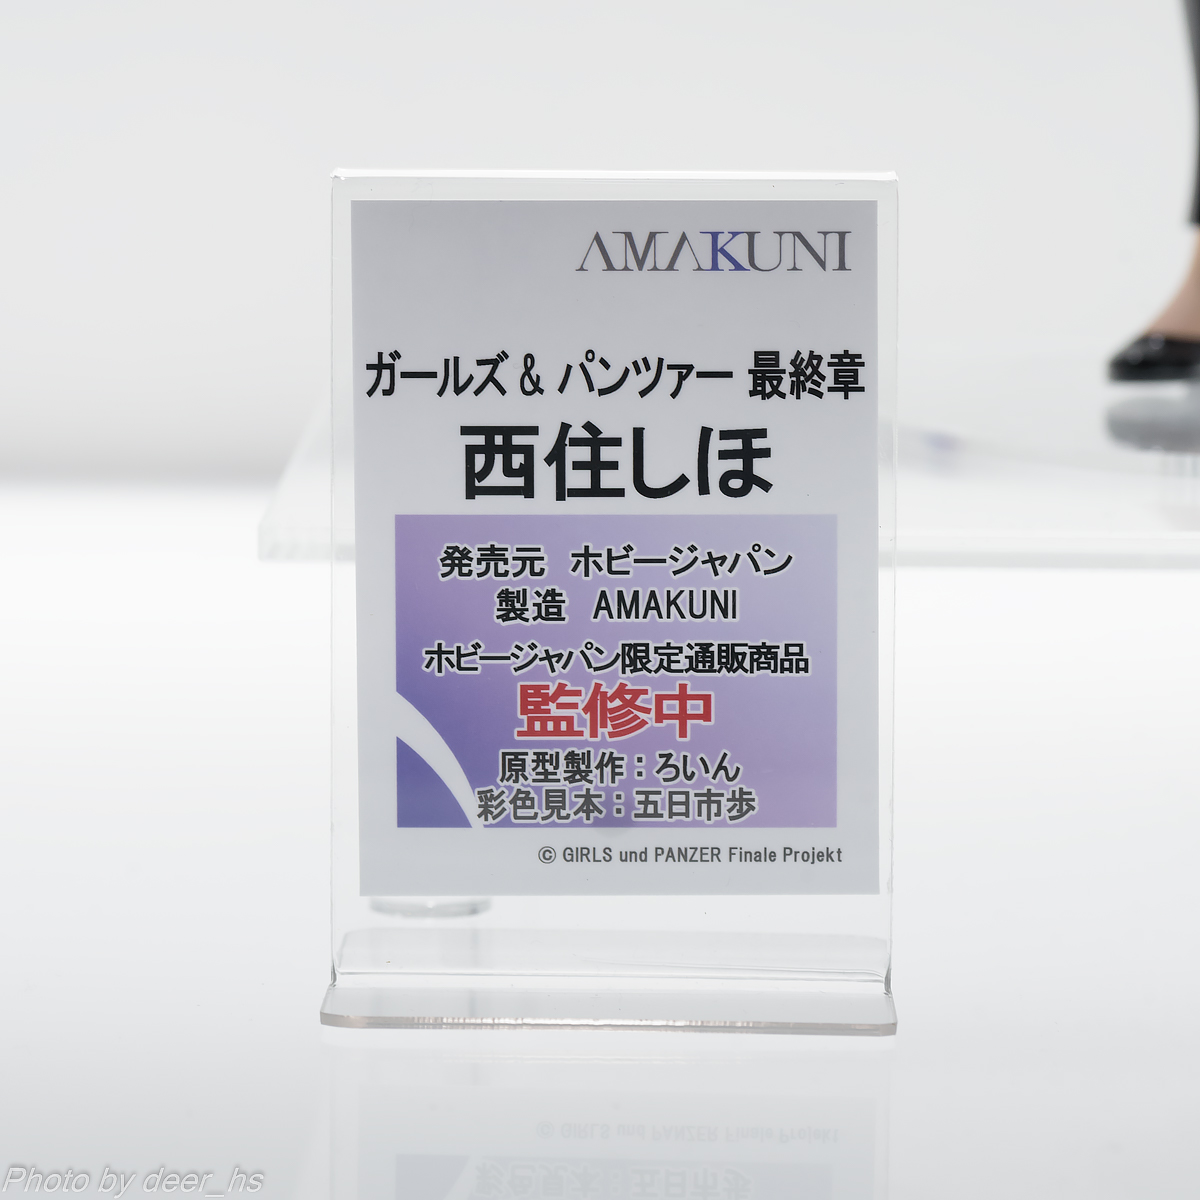 MGH2019SP-AMA-004